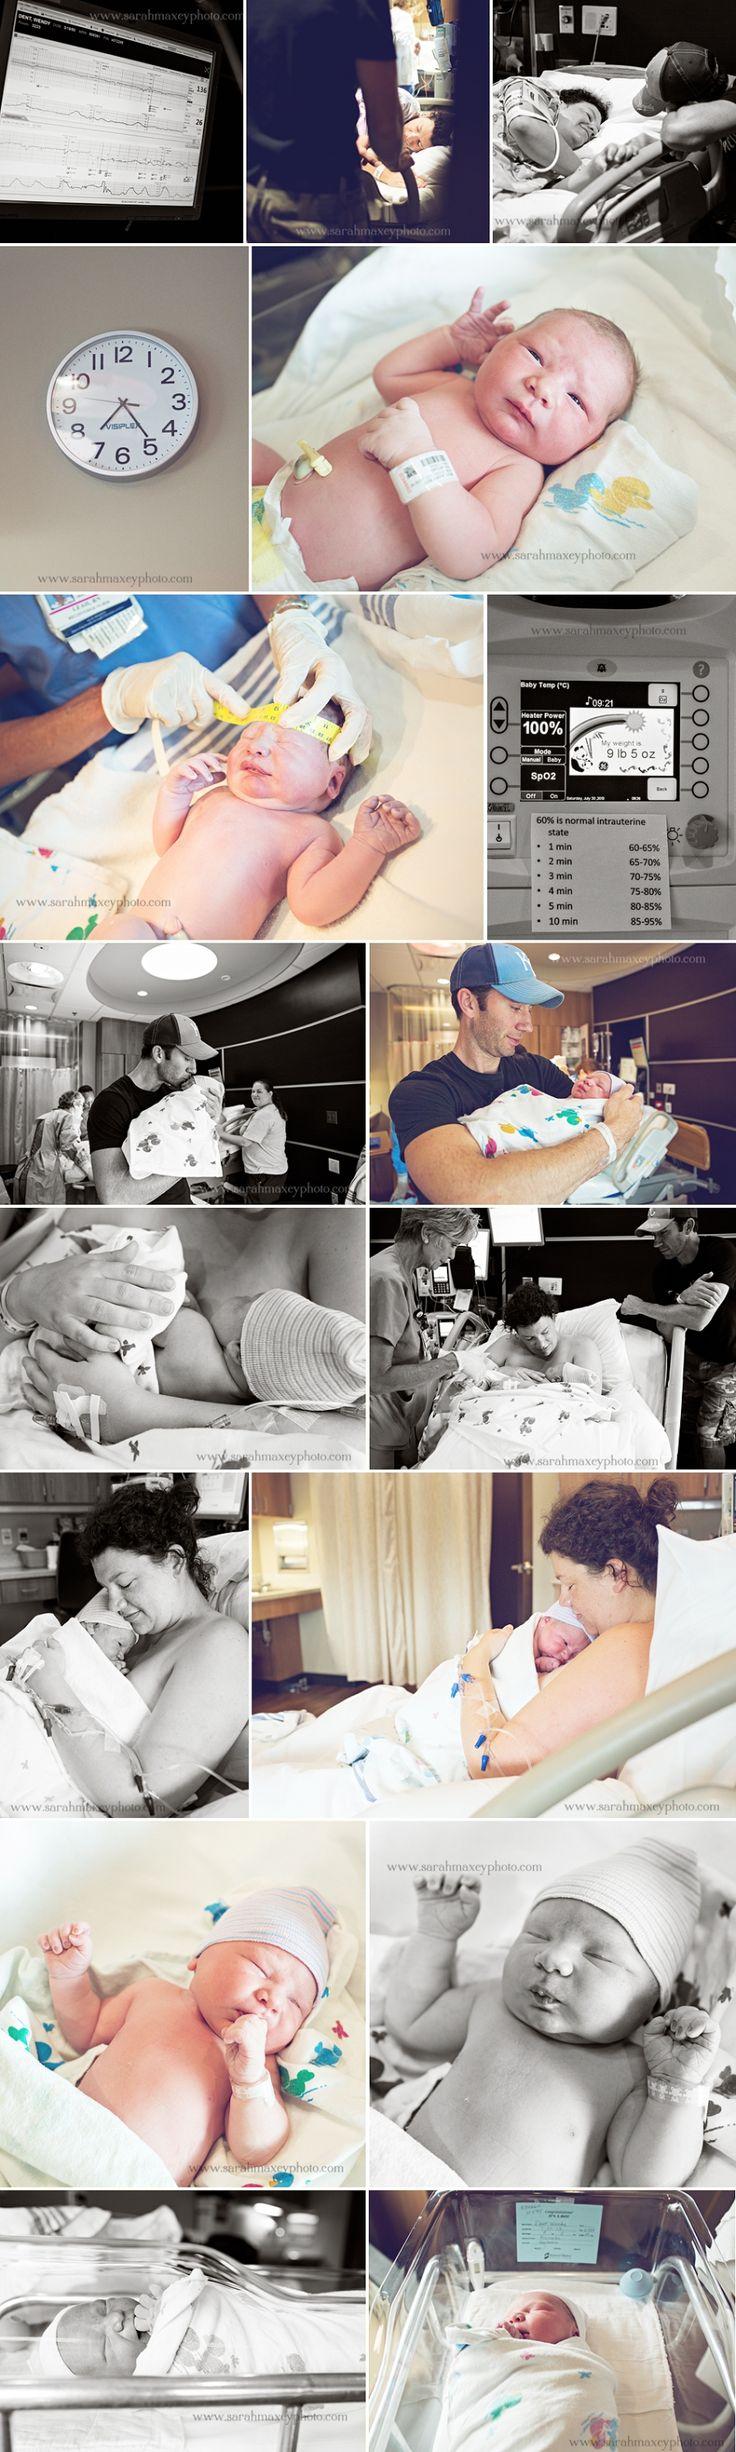 Hospital birth photography  Sarah Maxey Kansas City Birth Photographer and Portrait Photographer